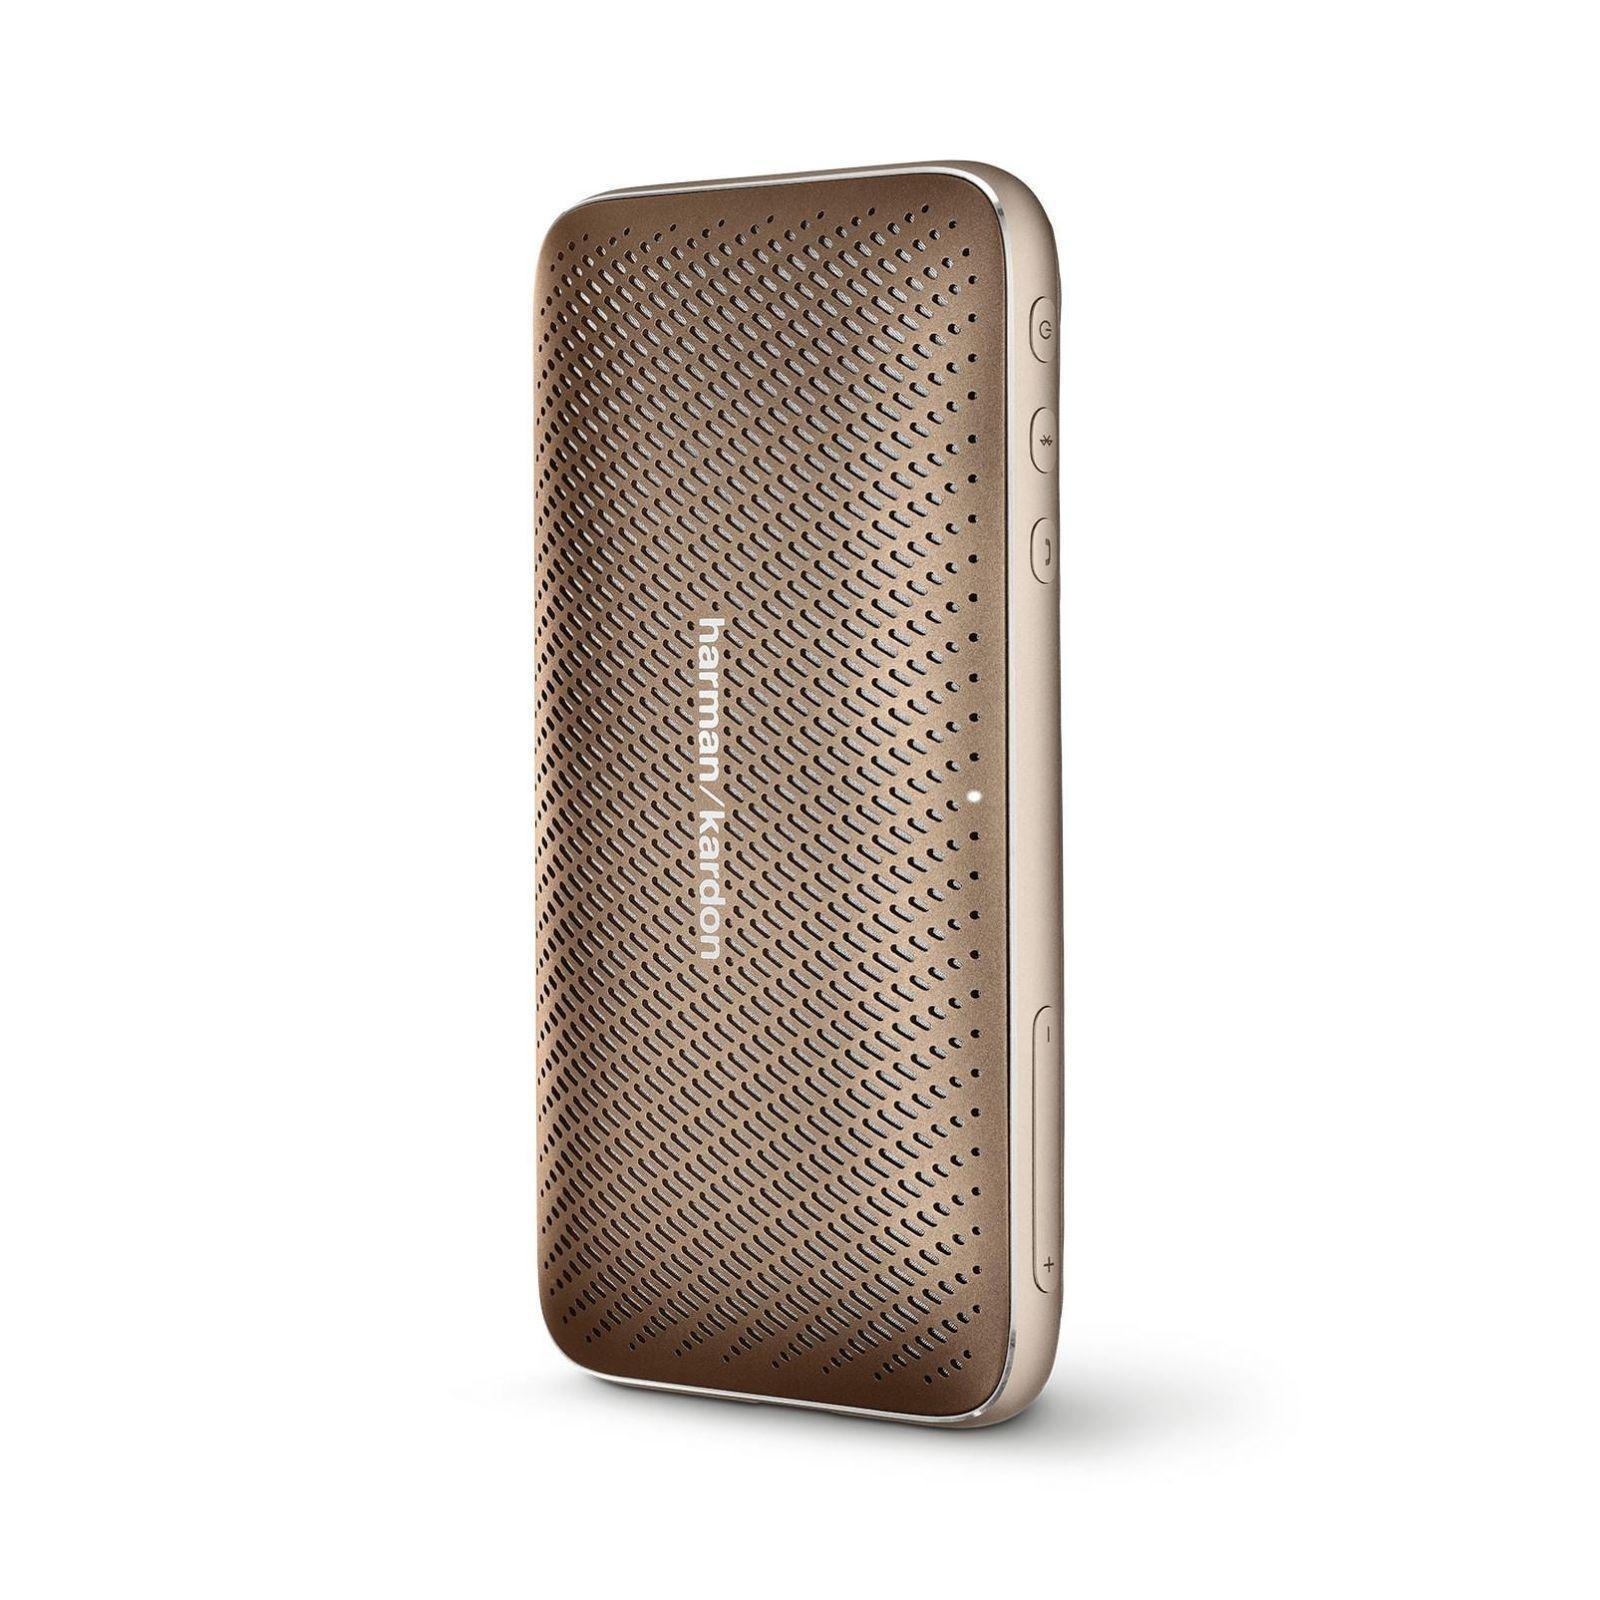 Harman Kardon выпустила портативную колонку Esquire Mini 2 в России (hk esquiremini2 suspend copperbrown)